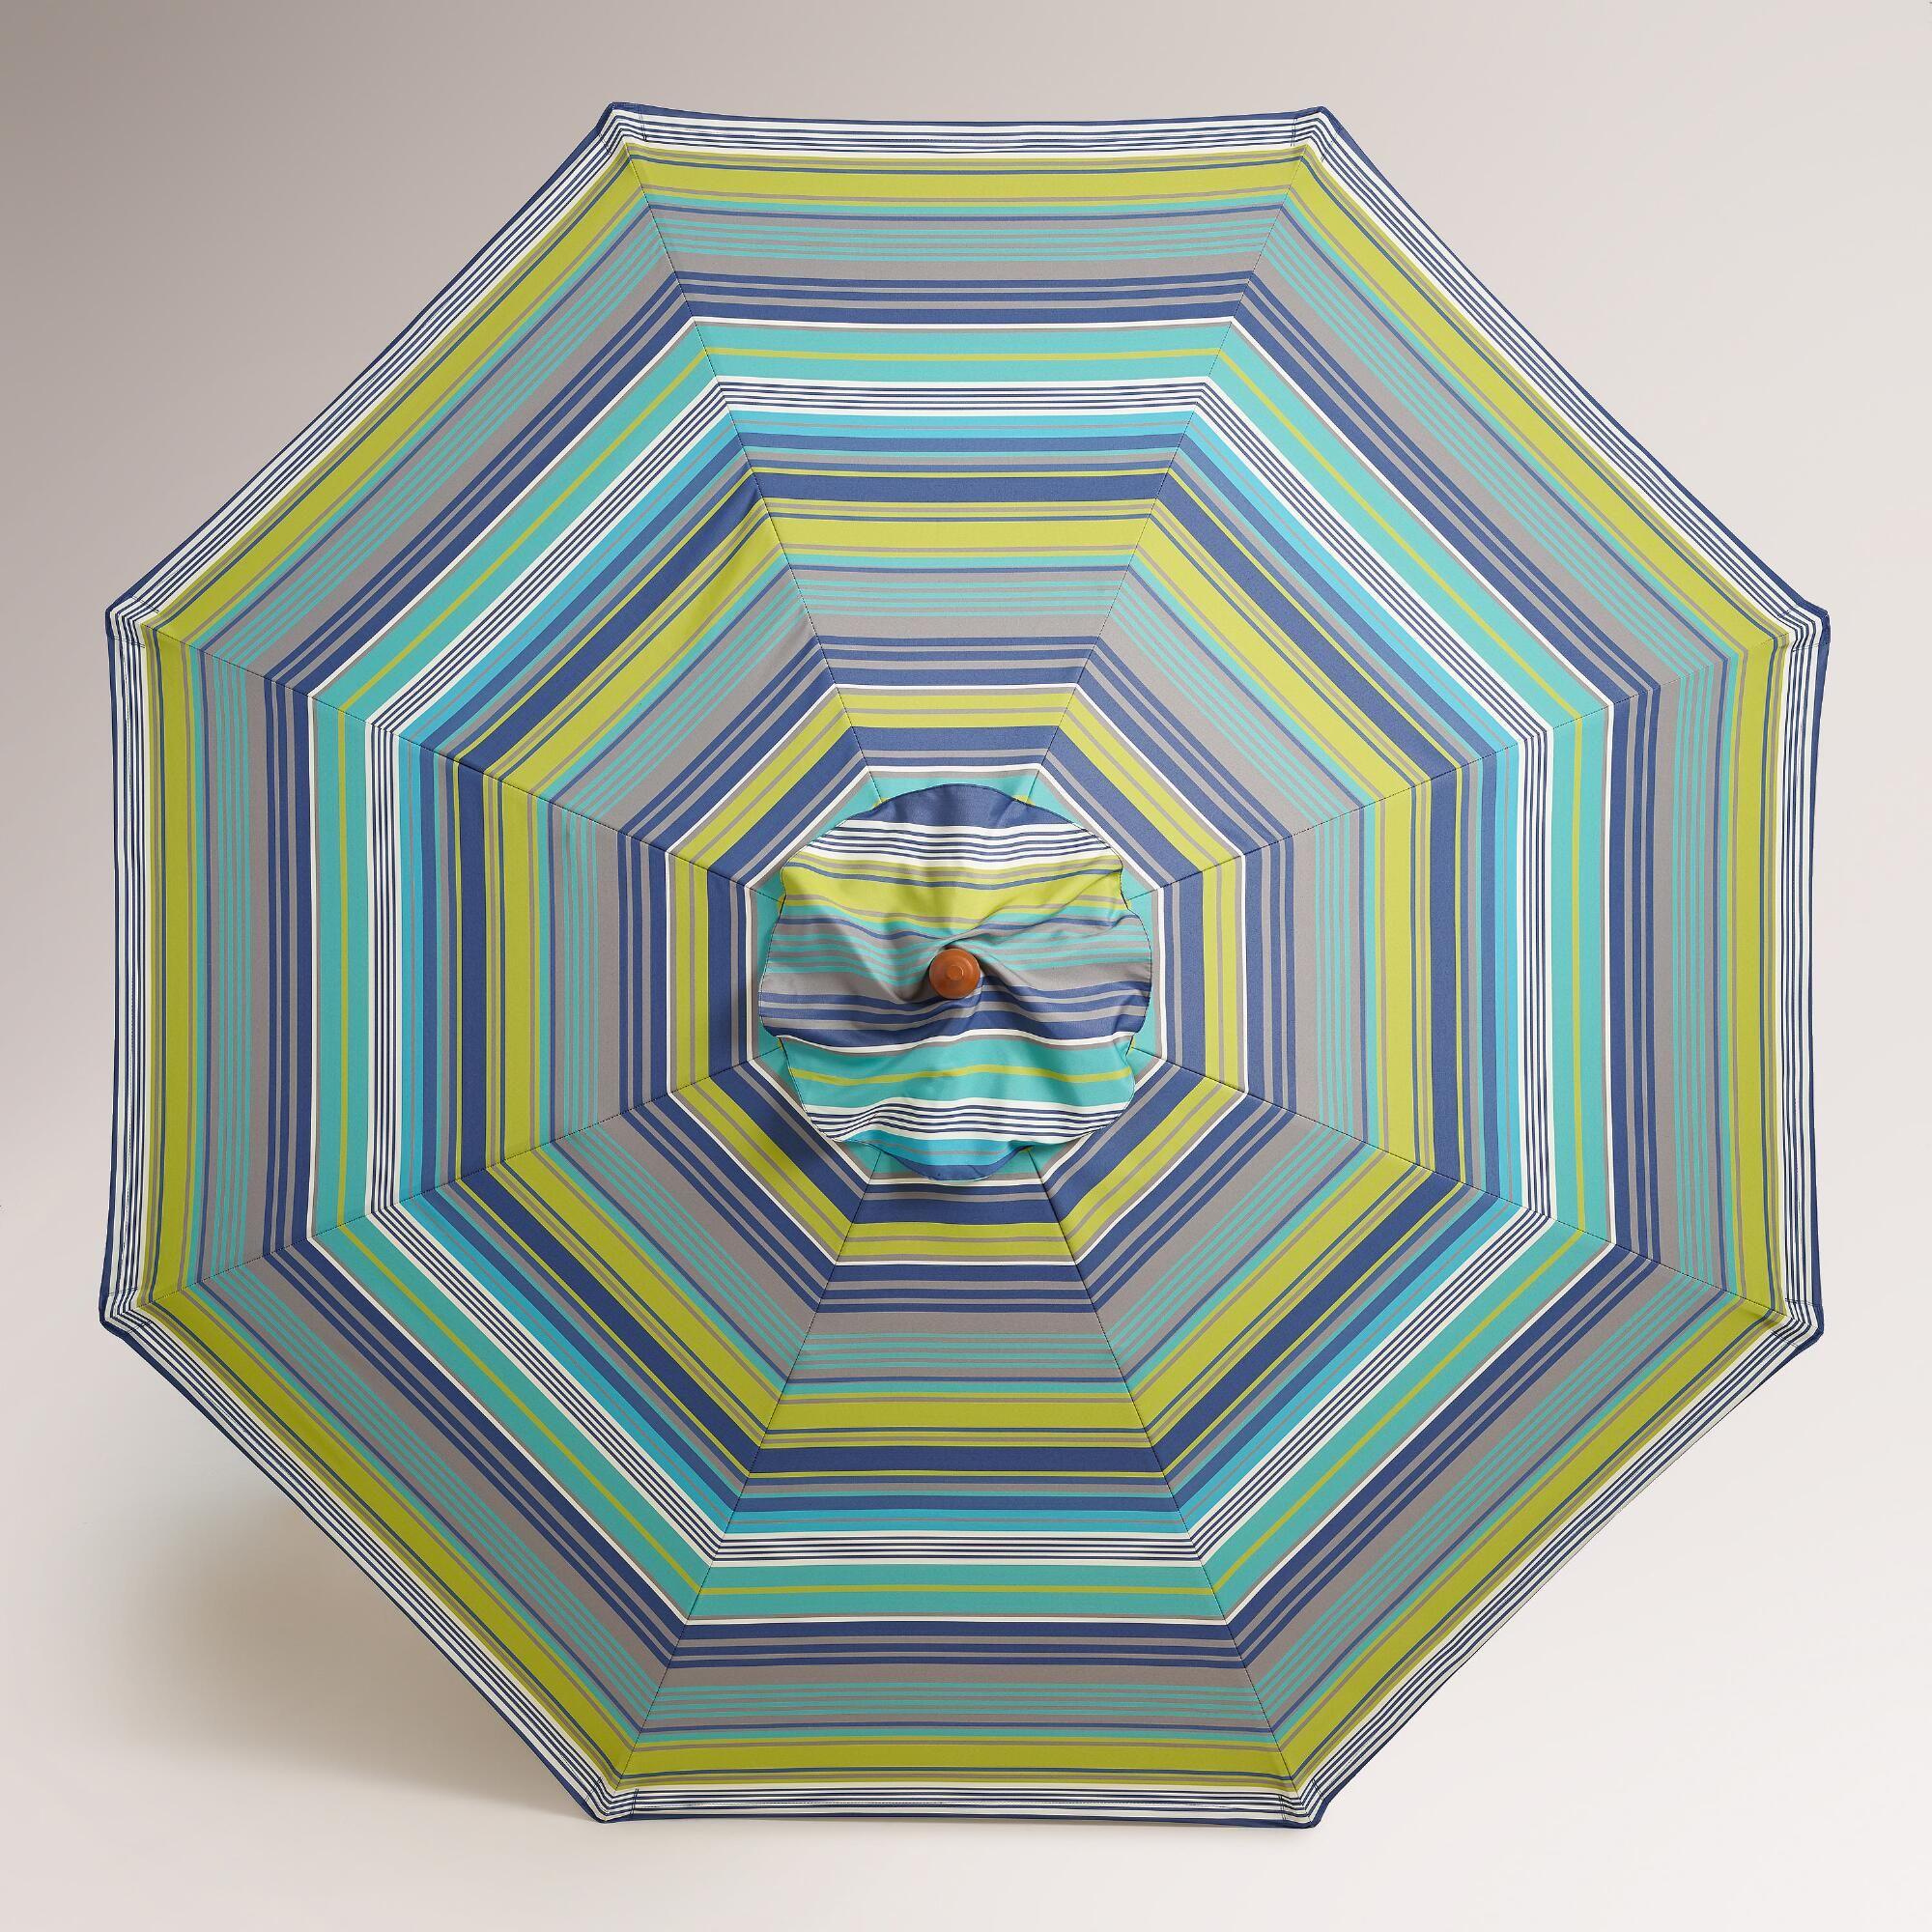 Cote Blue Striped 9u0027 Umbrella Canopy | World Market   LOVE These Colors!